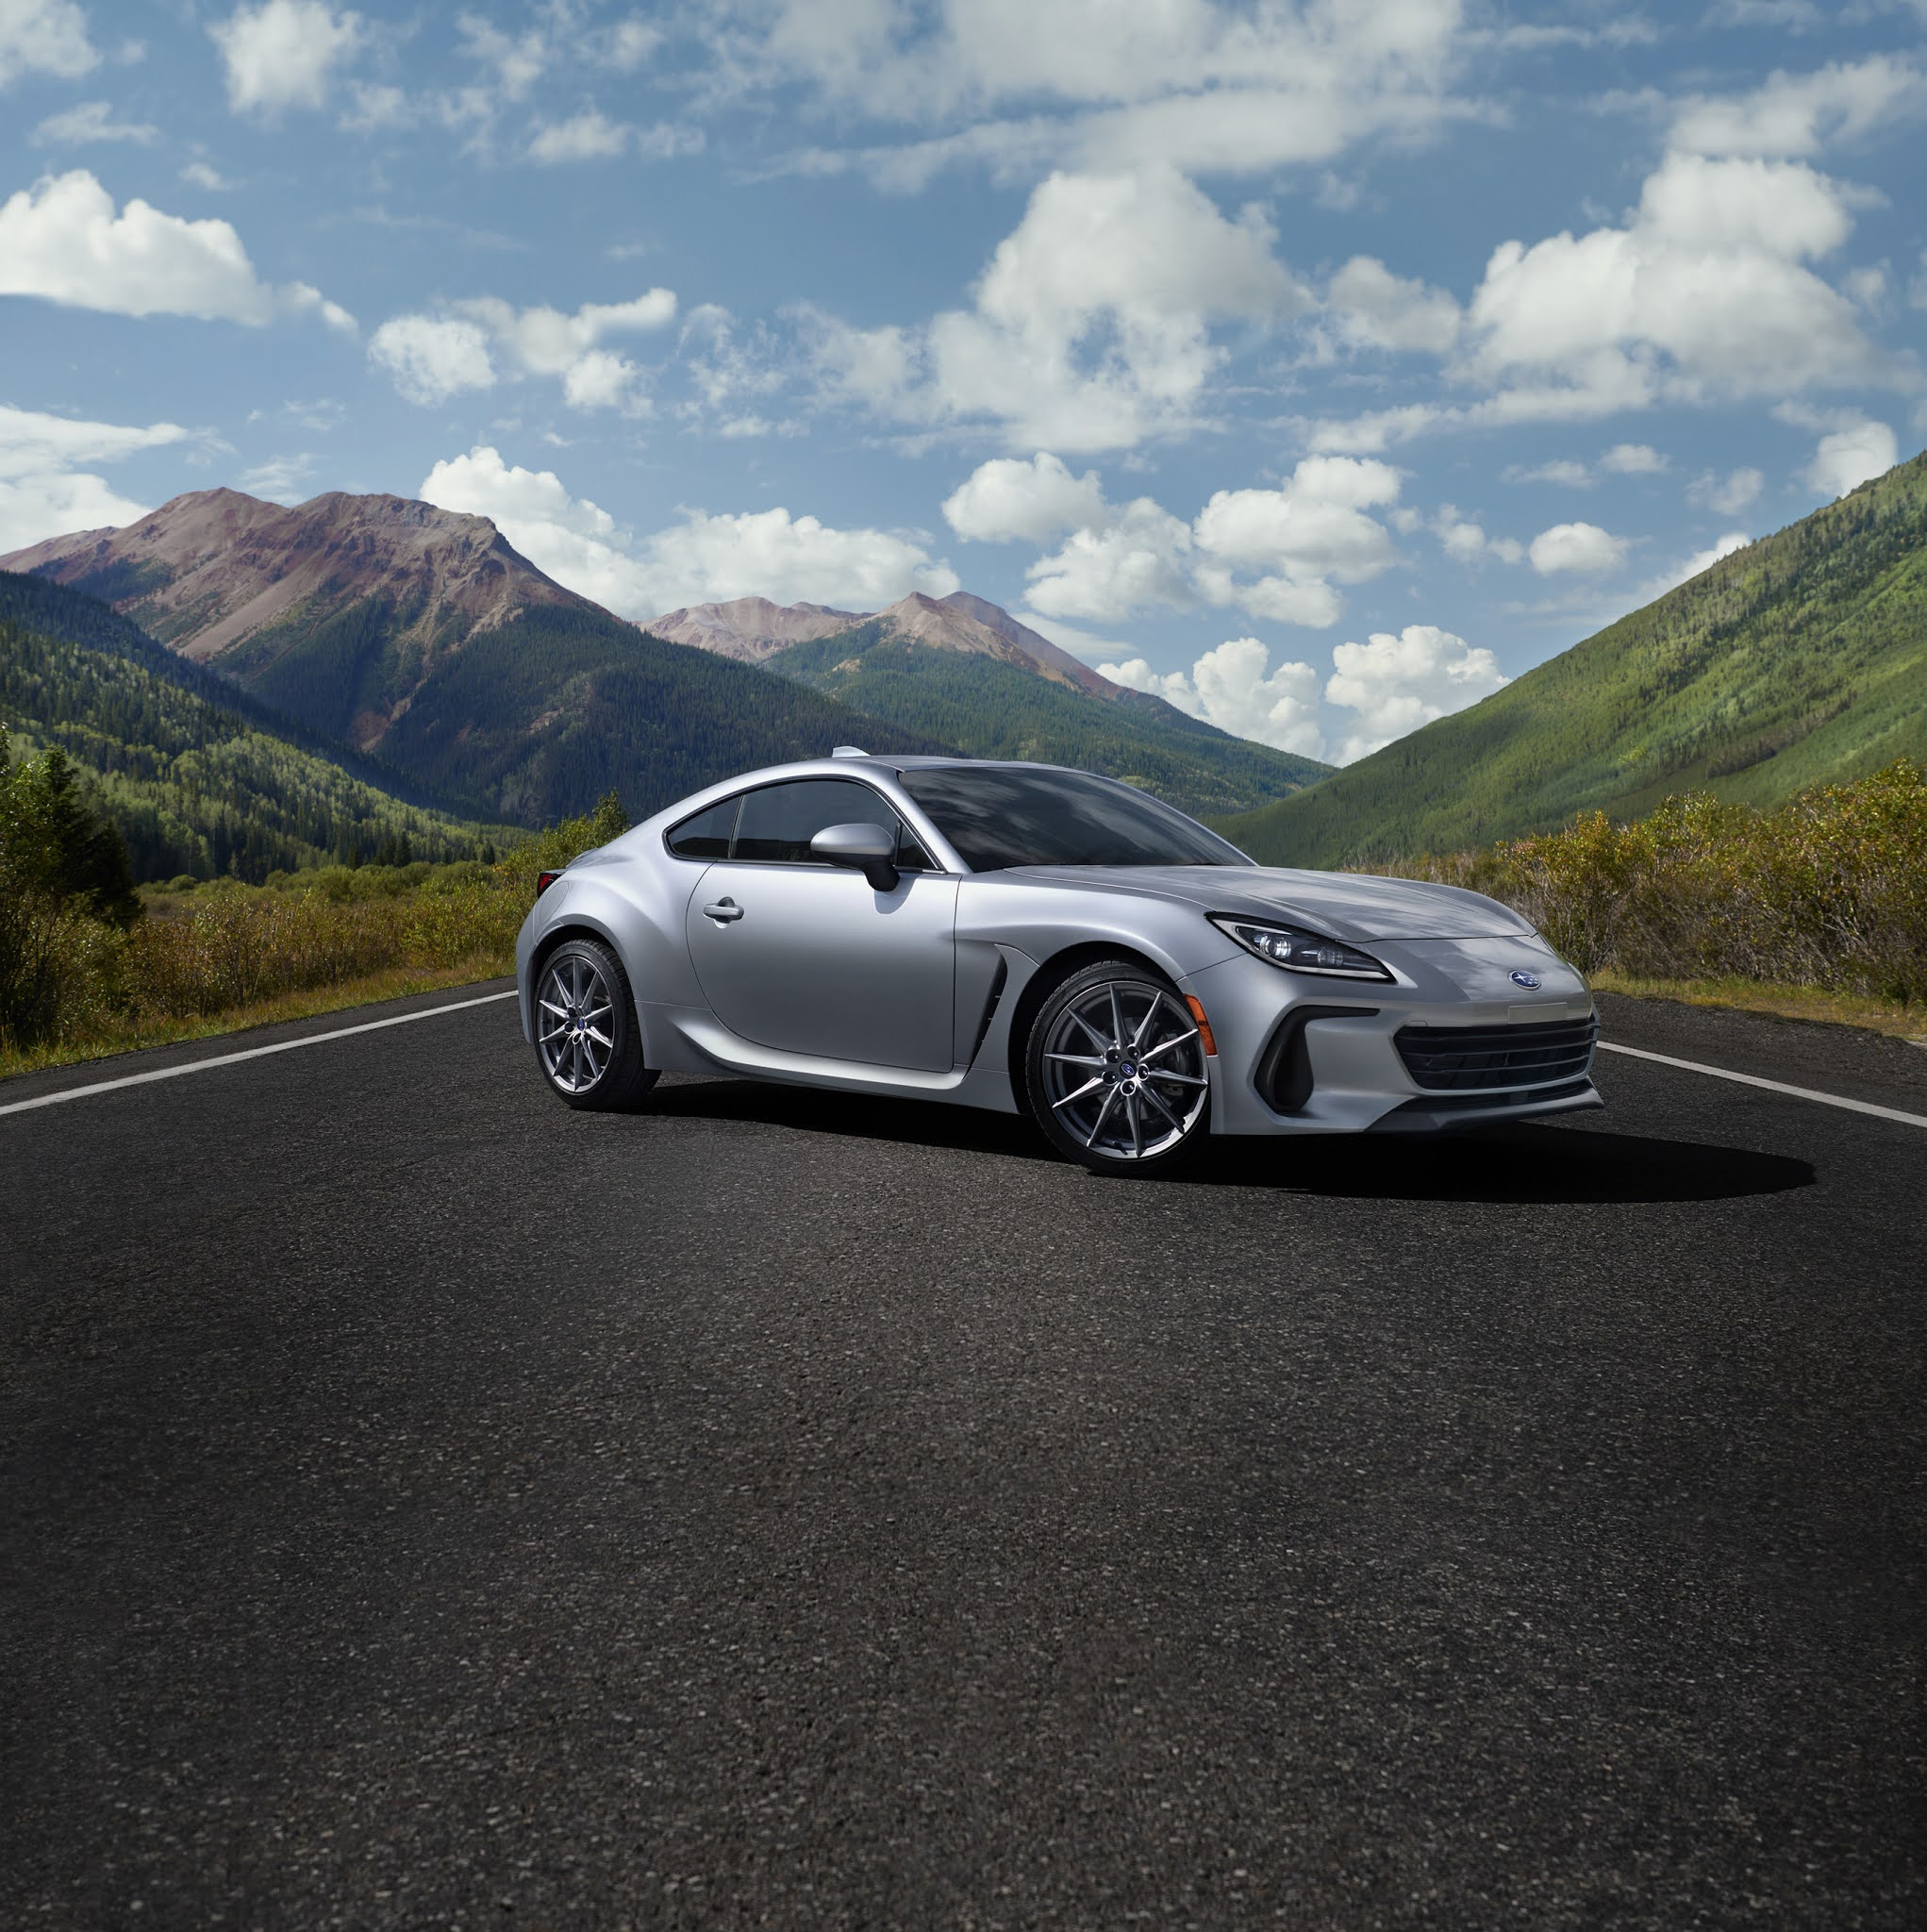 All-New 2022 Subaru BRZ Makes Global Debut